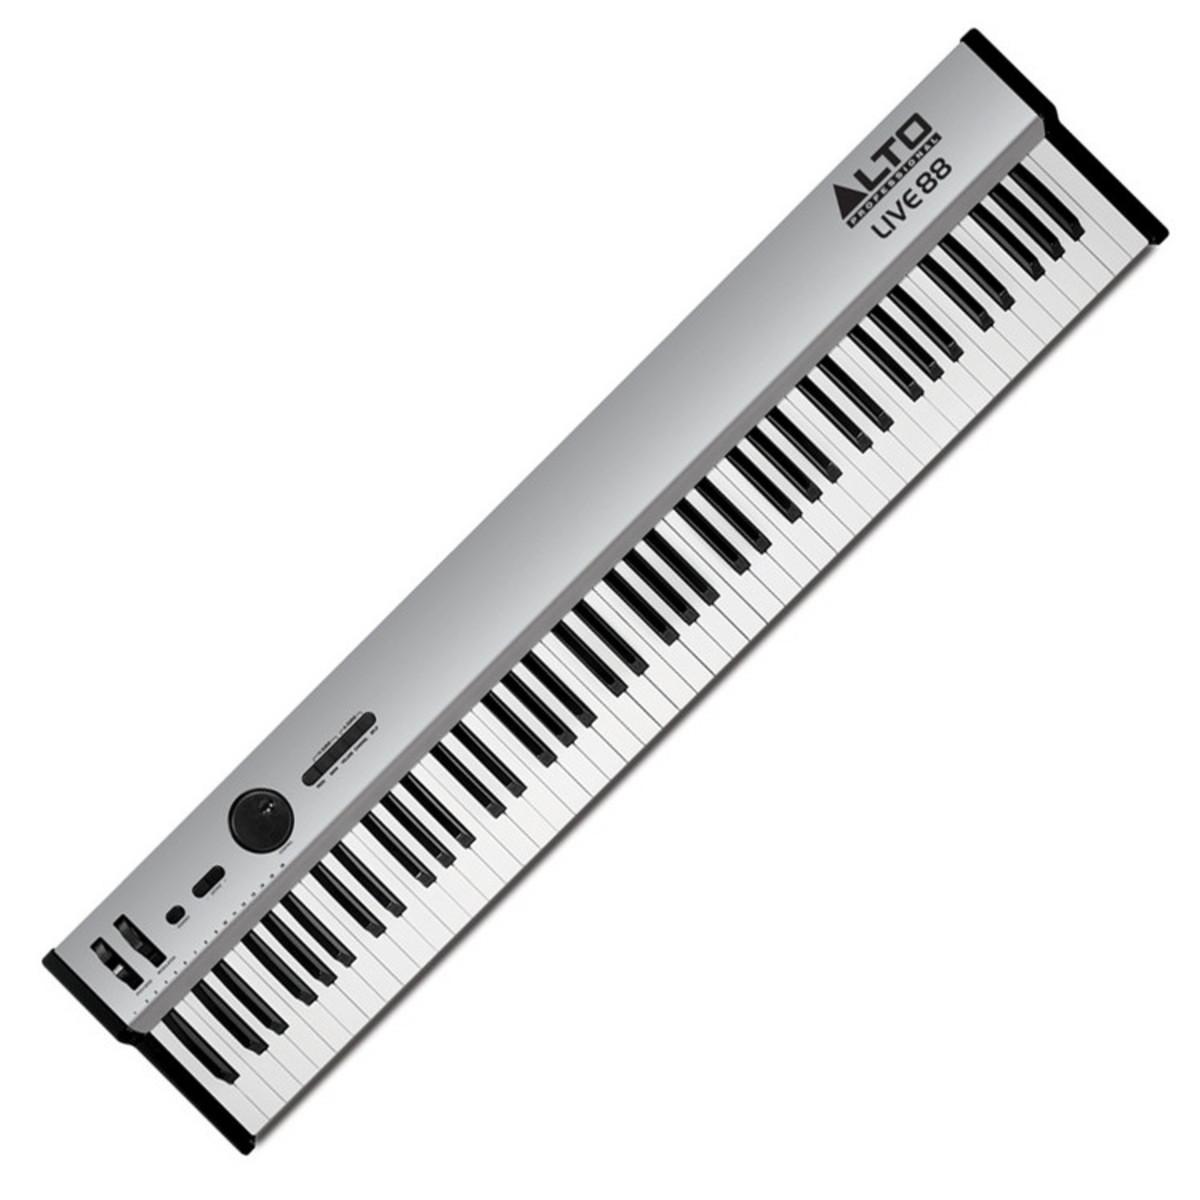 disc alto live 88 key midi performance controller keyboard at. Black Bedroom Furniture Sets. Home Design Ideas